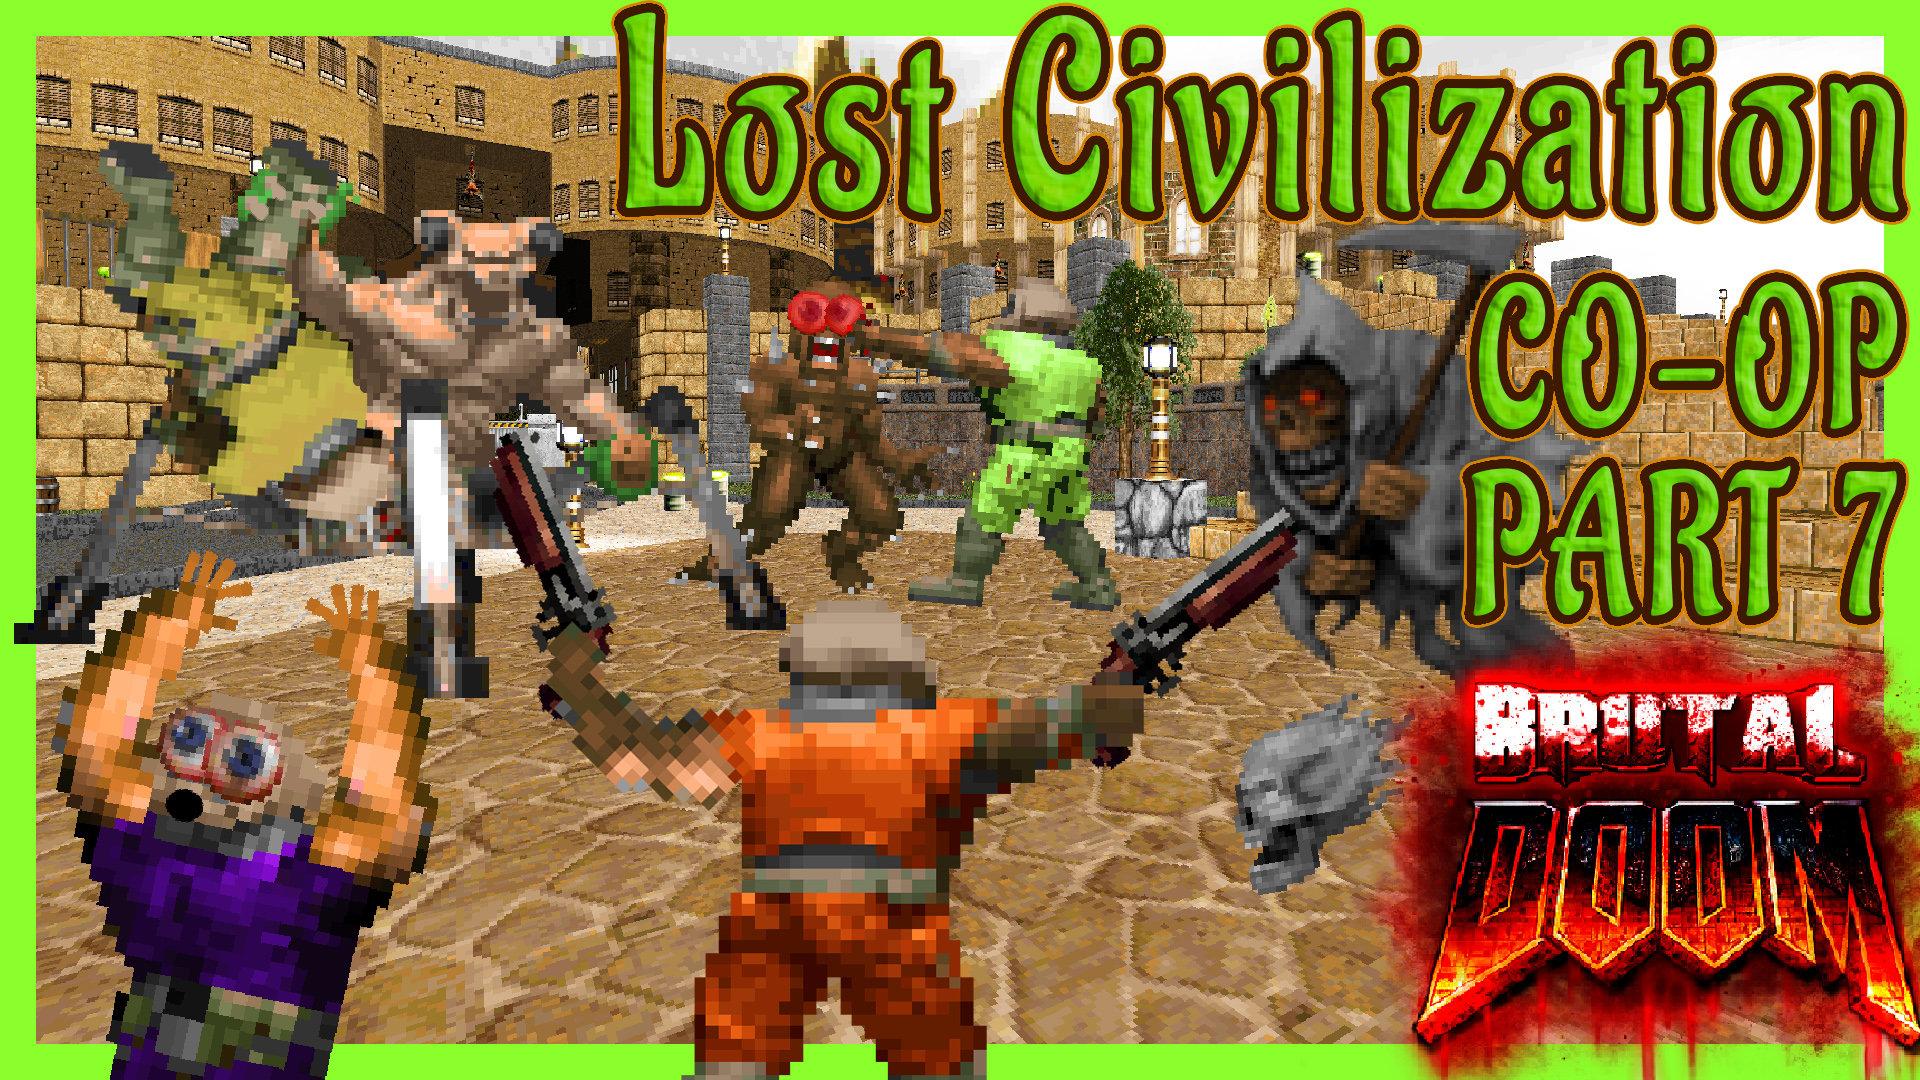 Lost Civilization (BD) part7.jpg